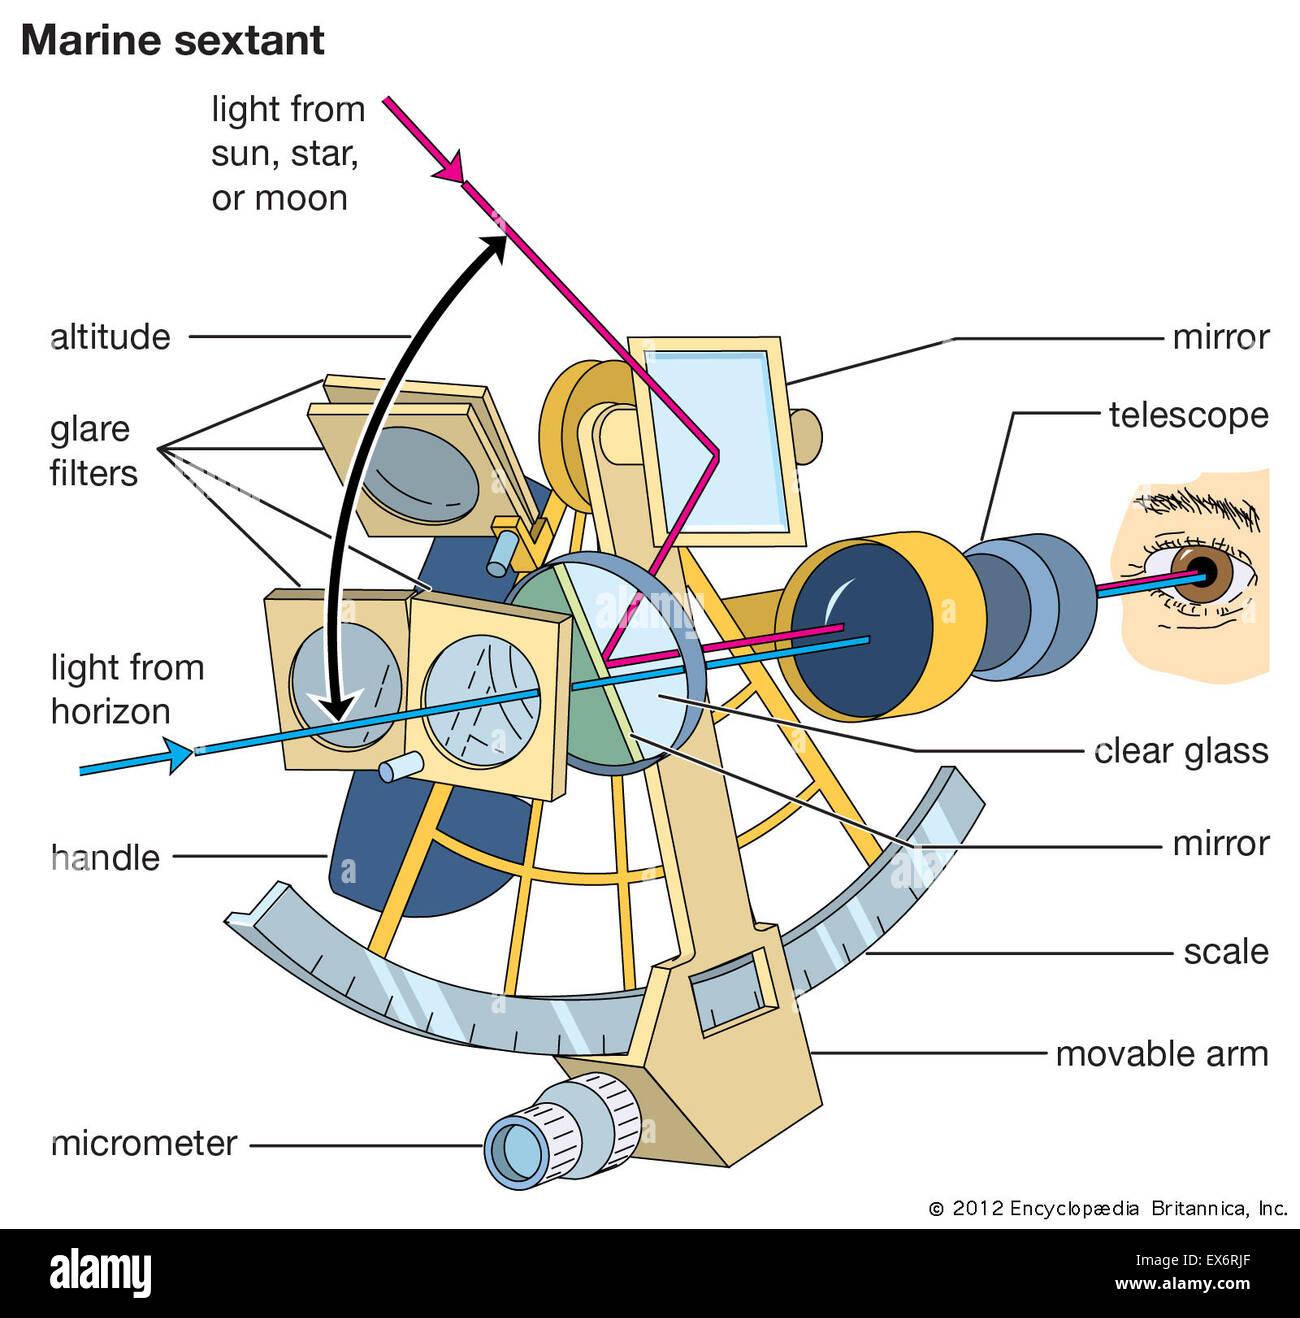 Navigation Marinetant Stock Photo